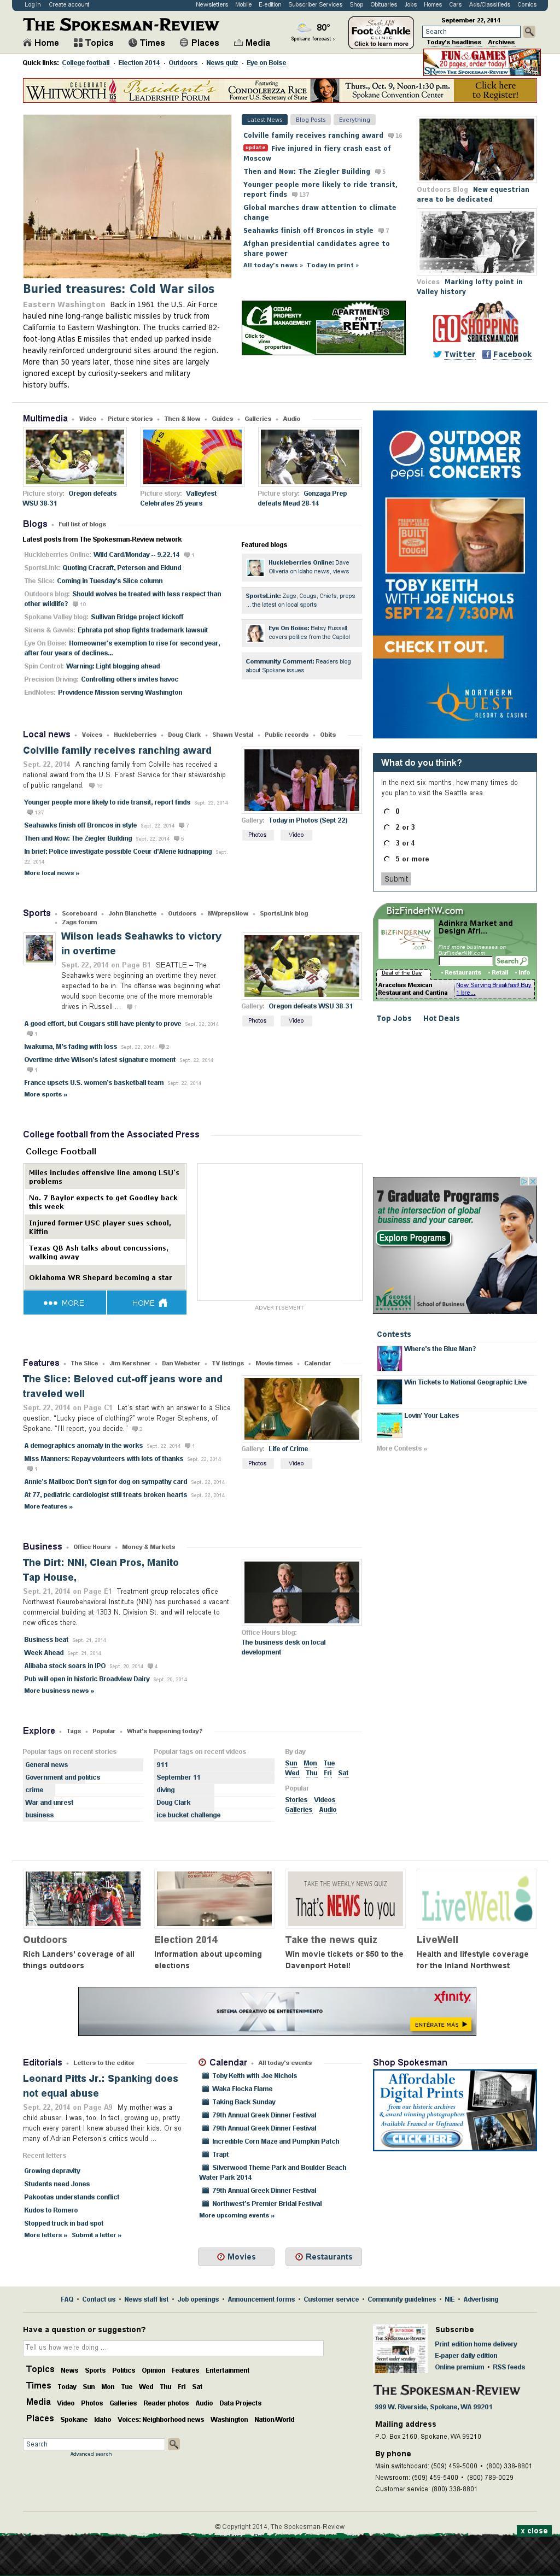 The (Spokane) Spokesman-Review at Tuesday Sept. 23, 2014, 1:21 a.m. UTC